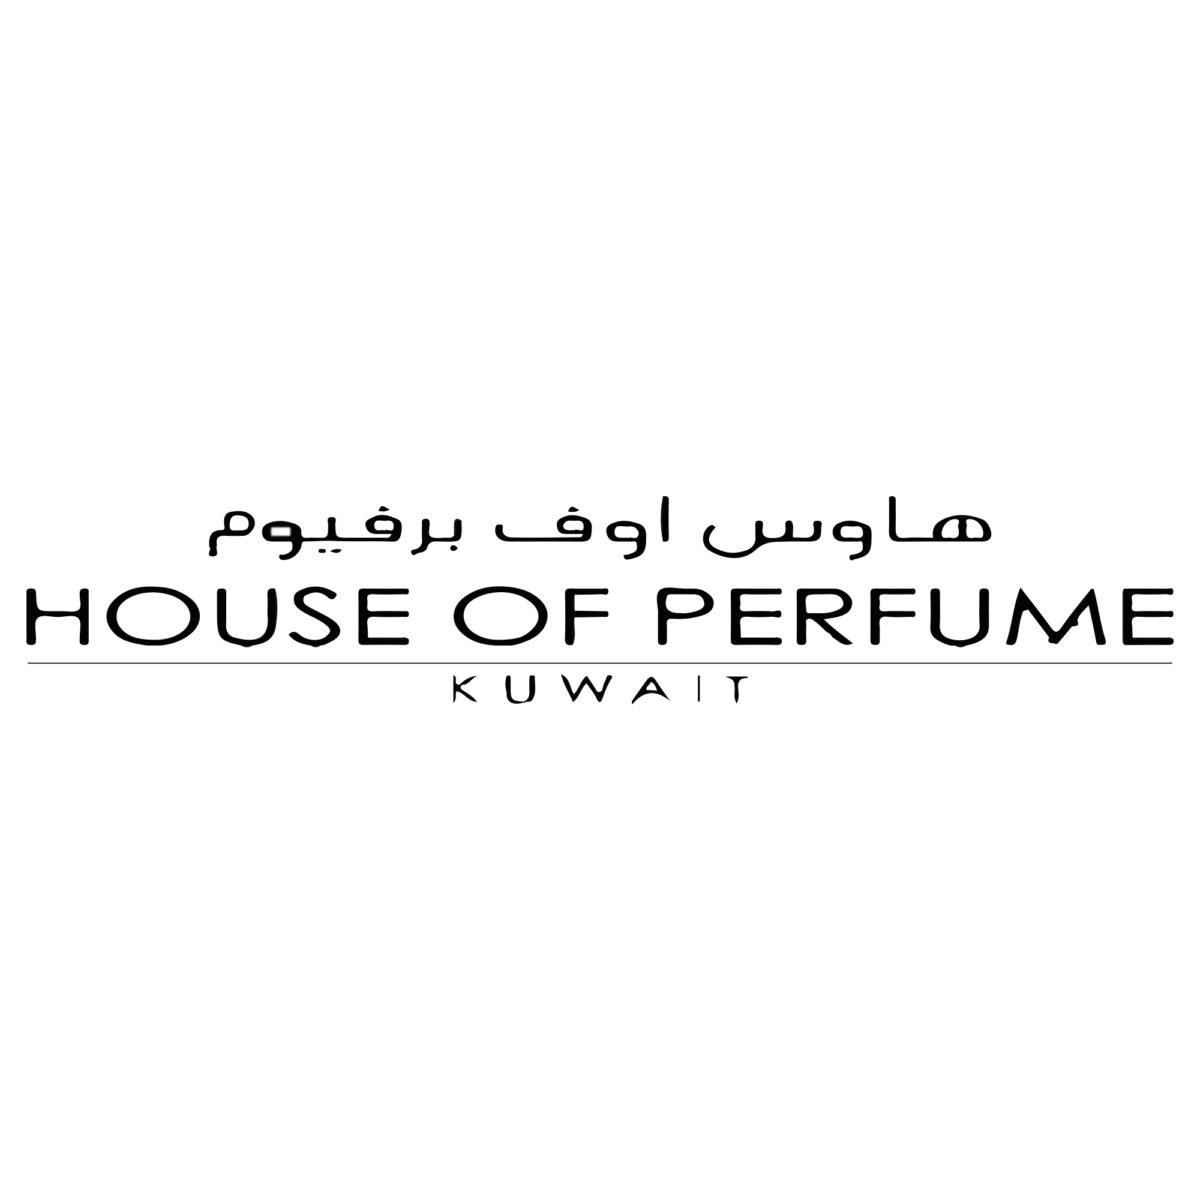 House of Perfume